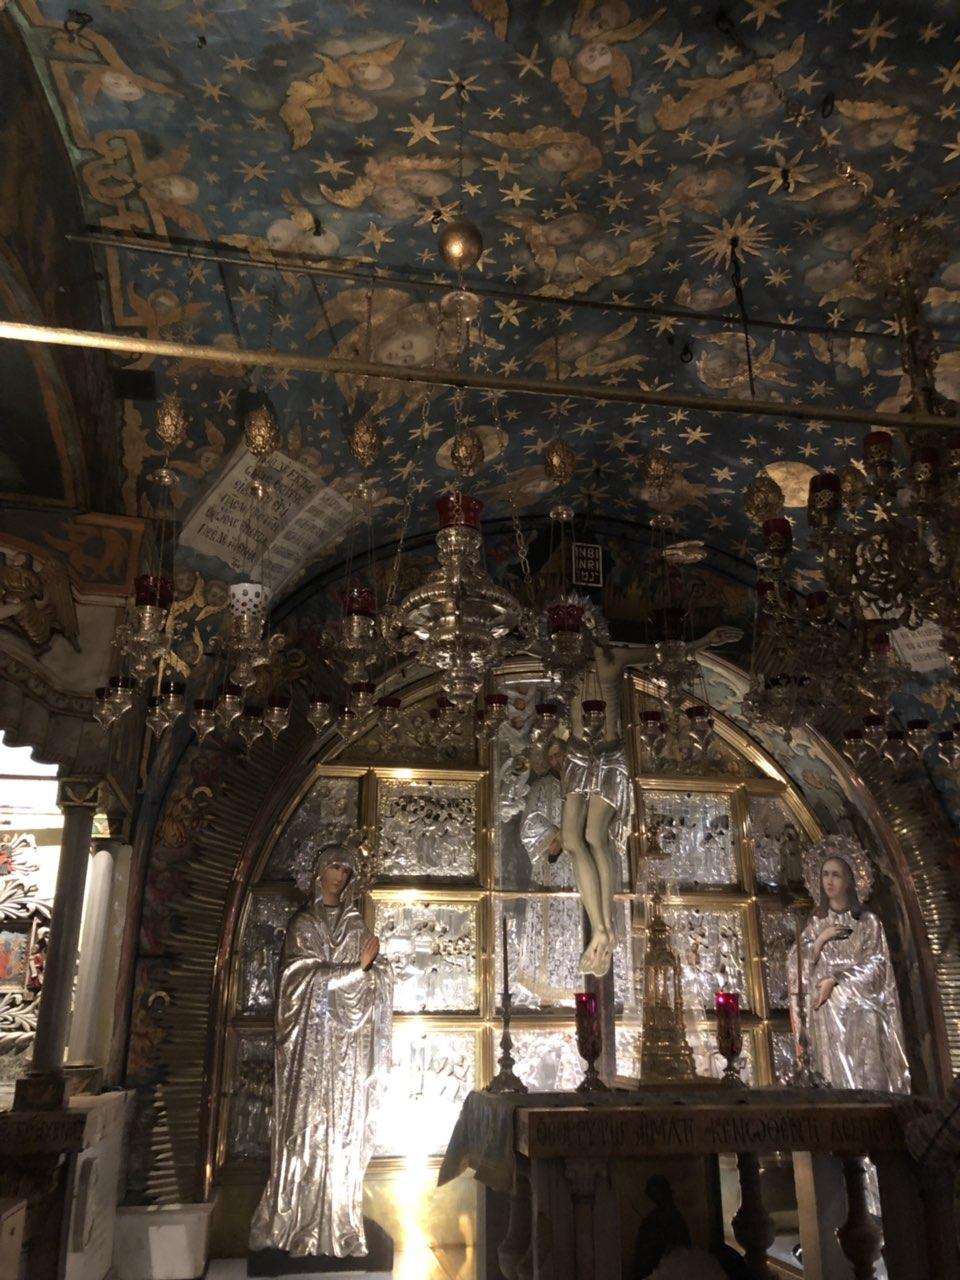 ierosolyma2019 11 - Λαρισαίοι Προσκυνητές Στην Αγία Γη Των Ιεροσολύμων (φωτο)